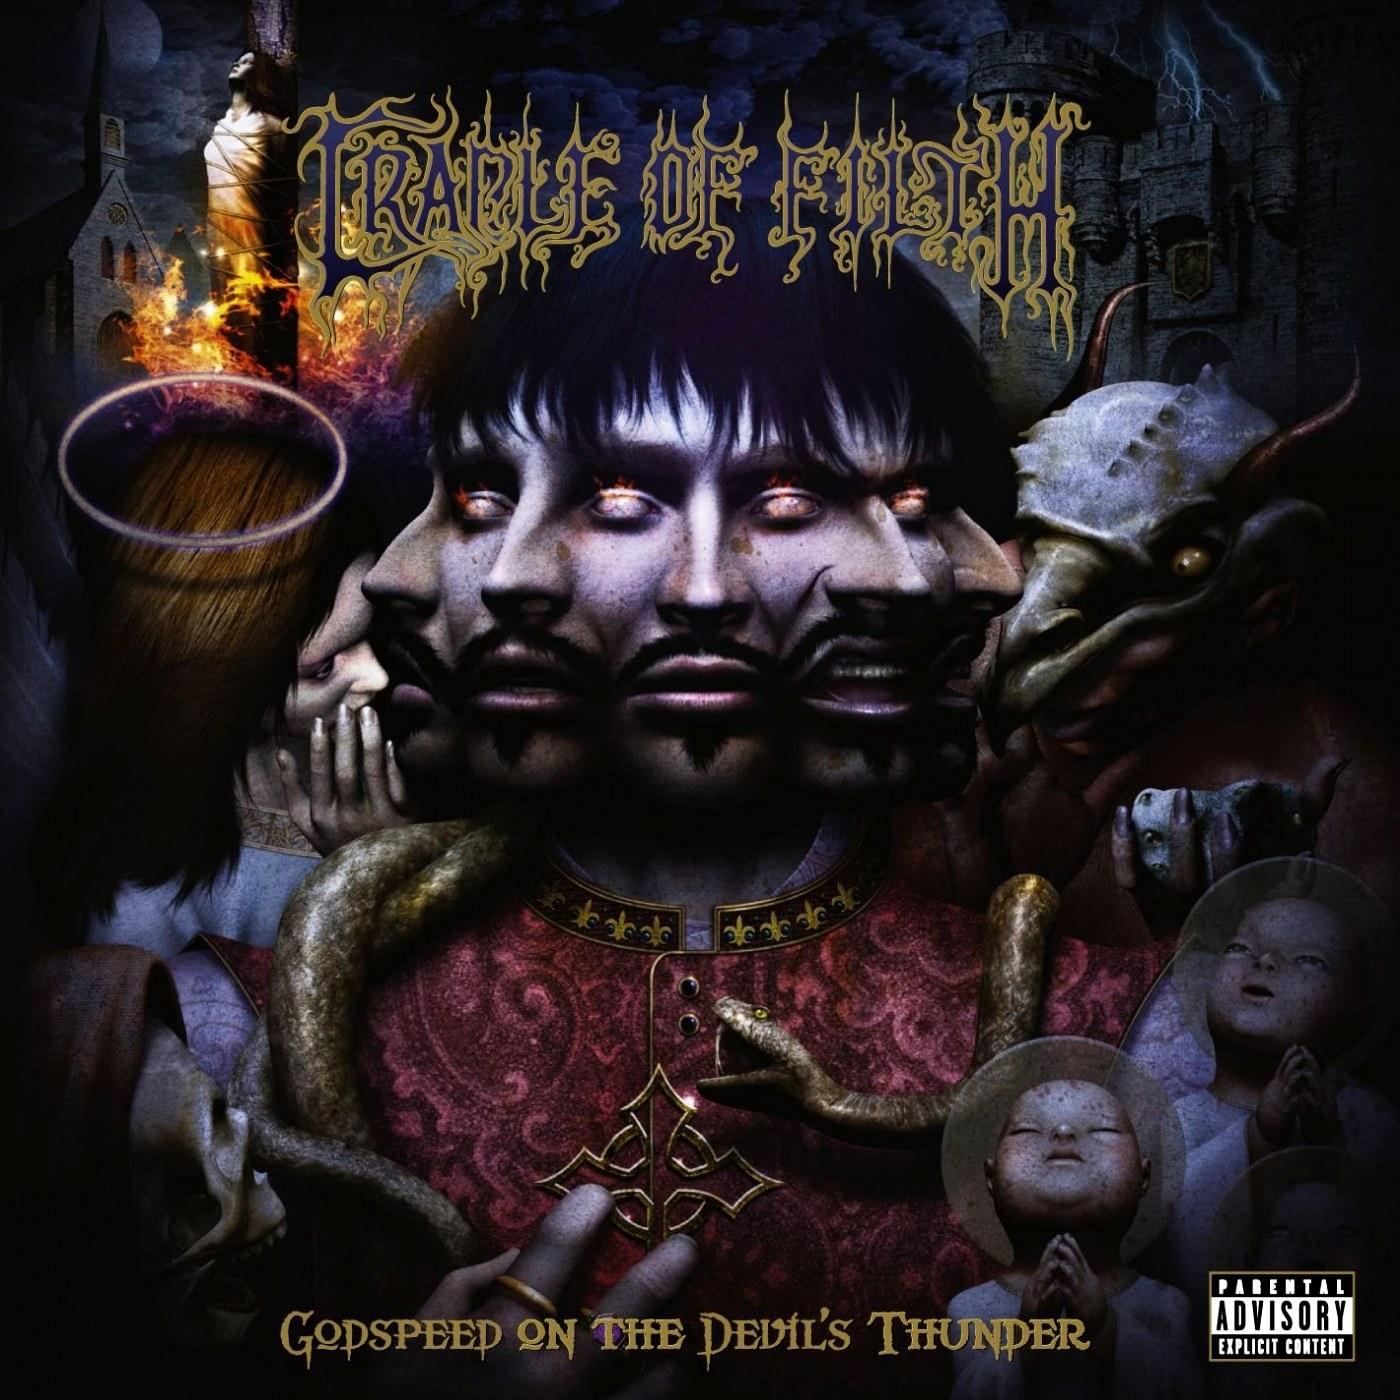 Reviews for Cradle of Filth - Godspeed on the Devil's Thunder